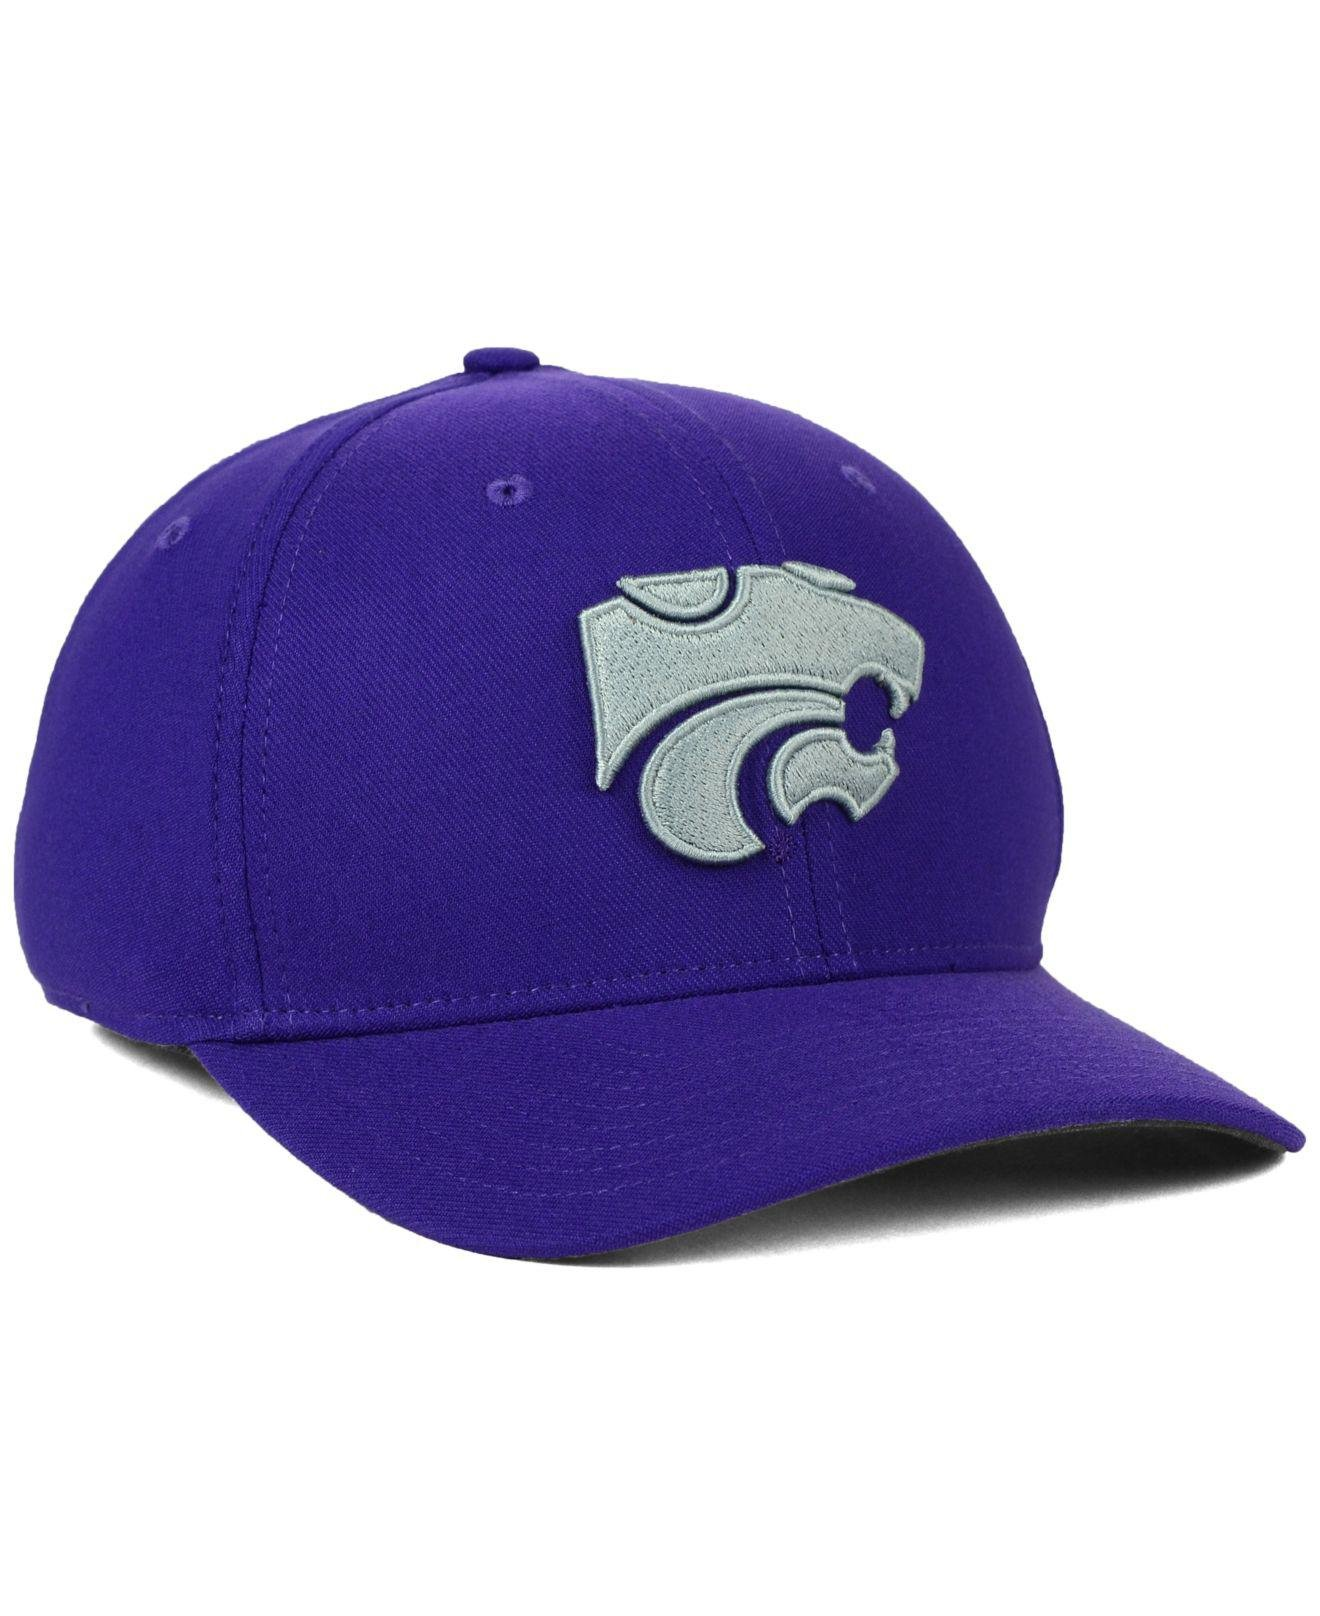 low cost 7a469 48e10 Nike - Purple Kansas State Wildcats Classic Swoosh Cap for Men - Lyst. View  fullscreen